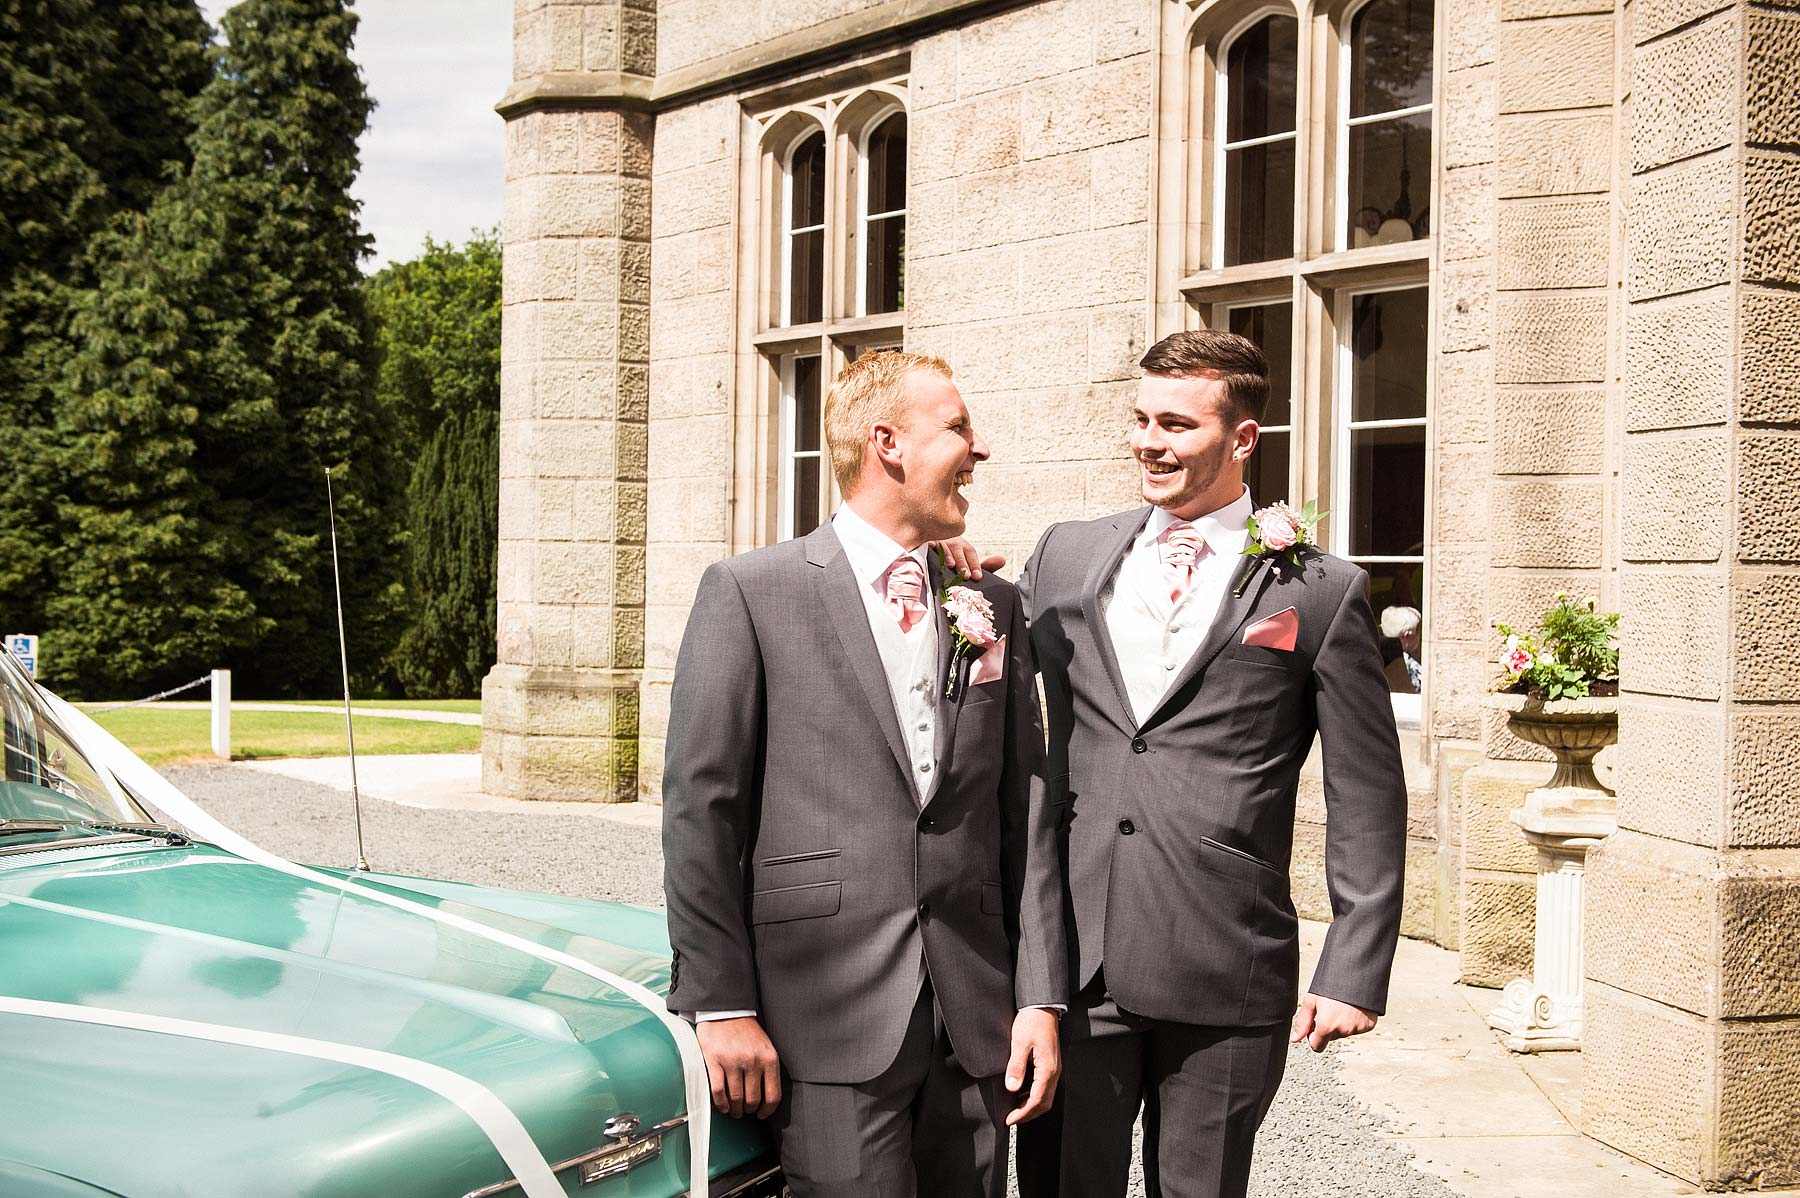 hawkesyard-estate-wedding-photographers-rugeley-018